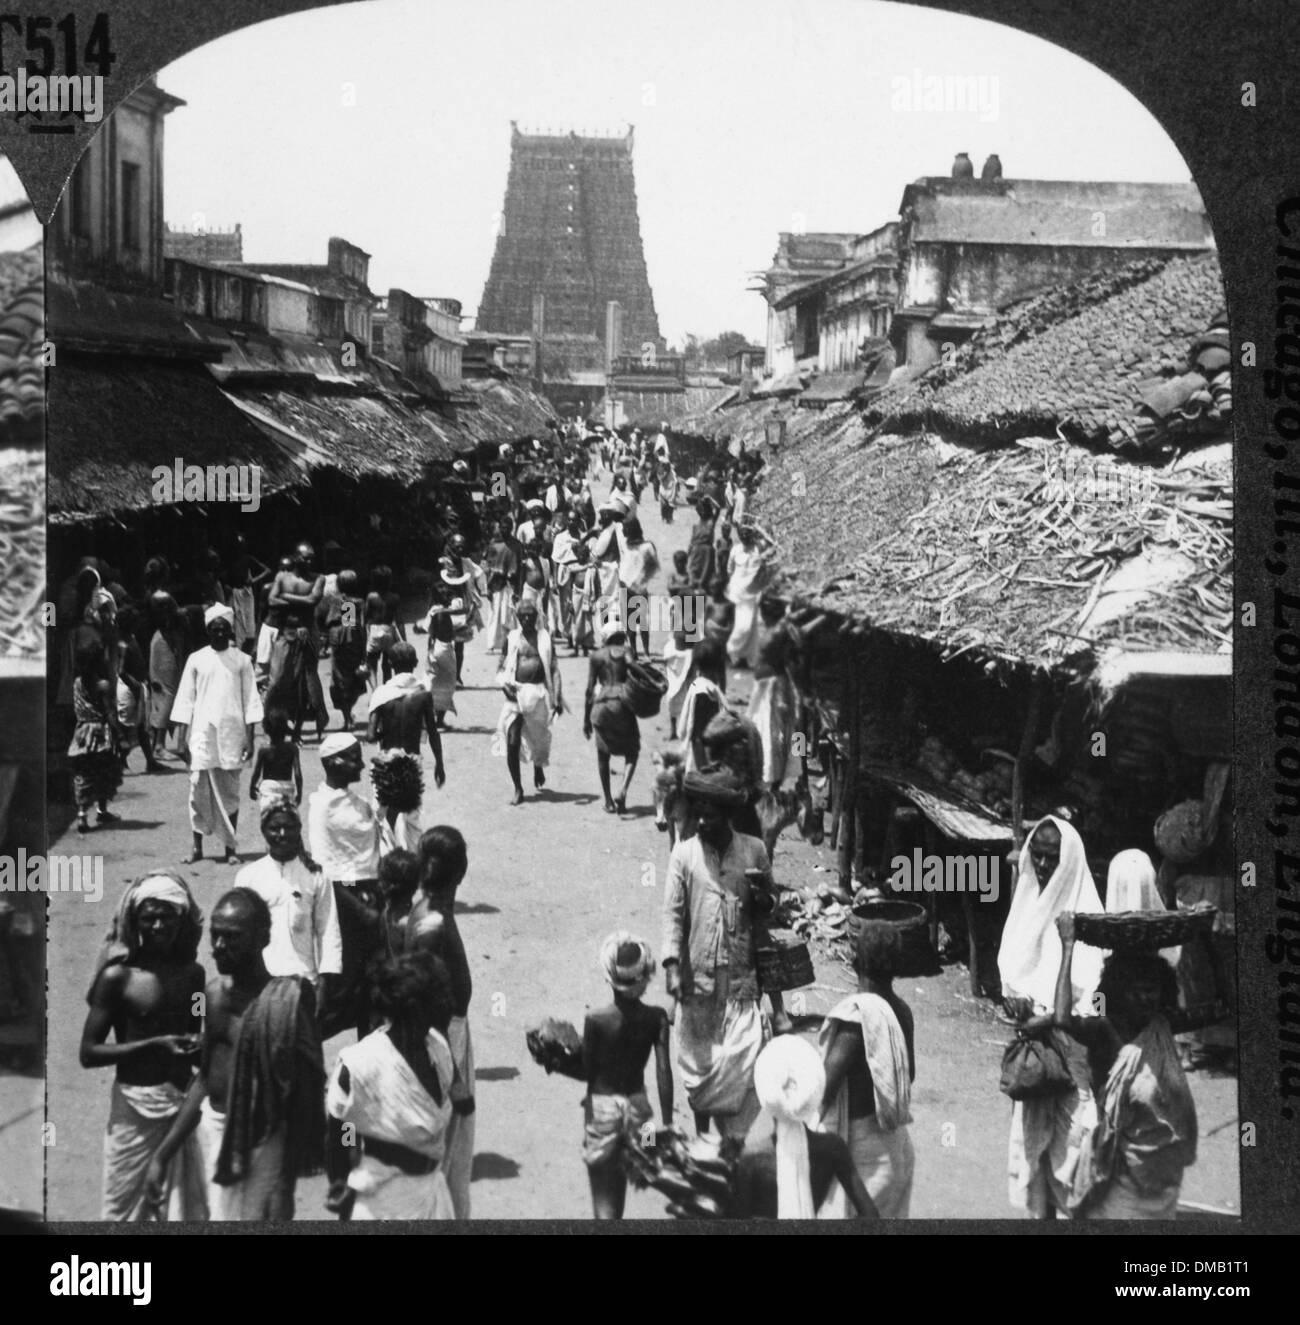 Busy Street Scene, Madura, India, 1900 - Stock Image